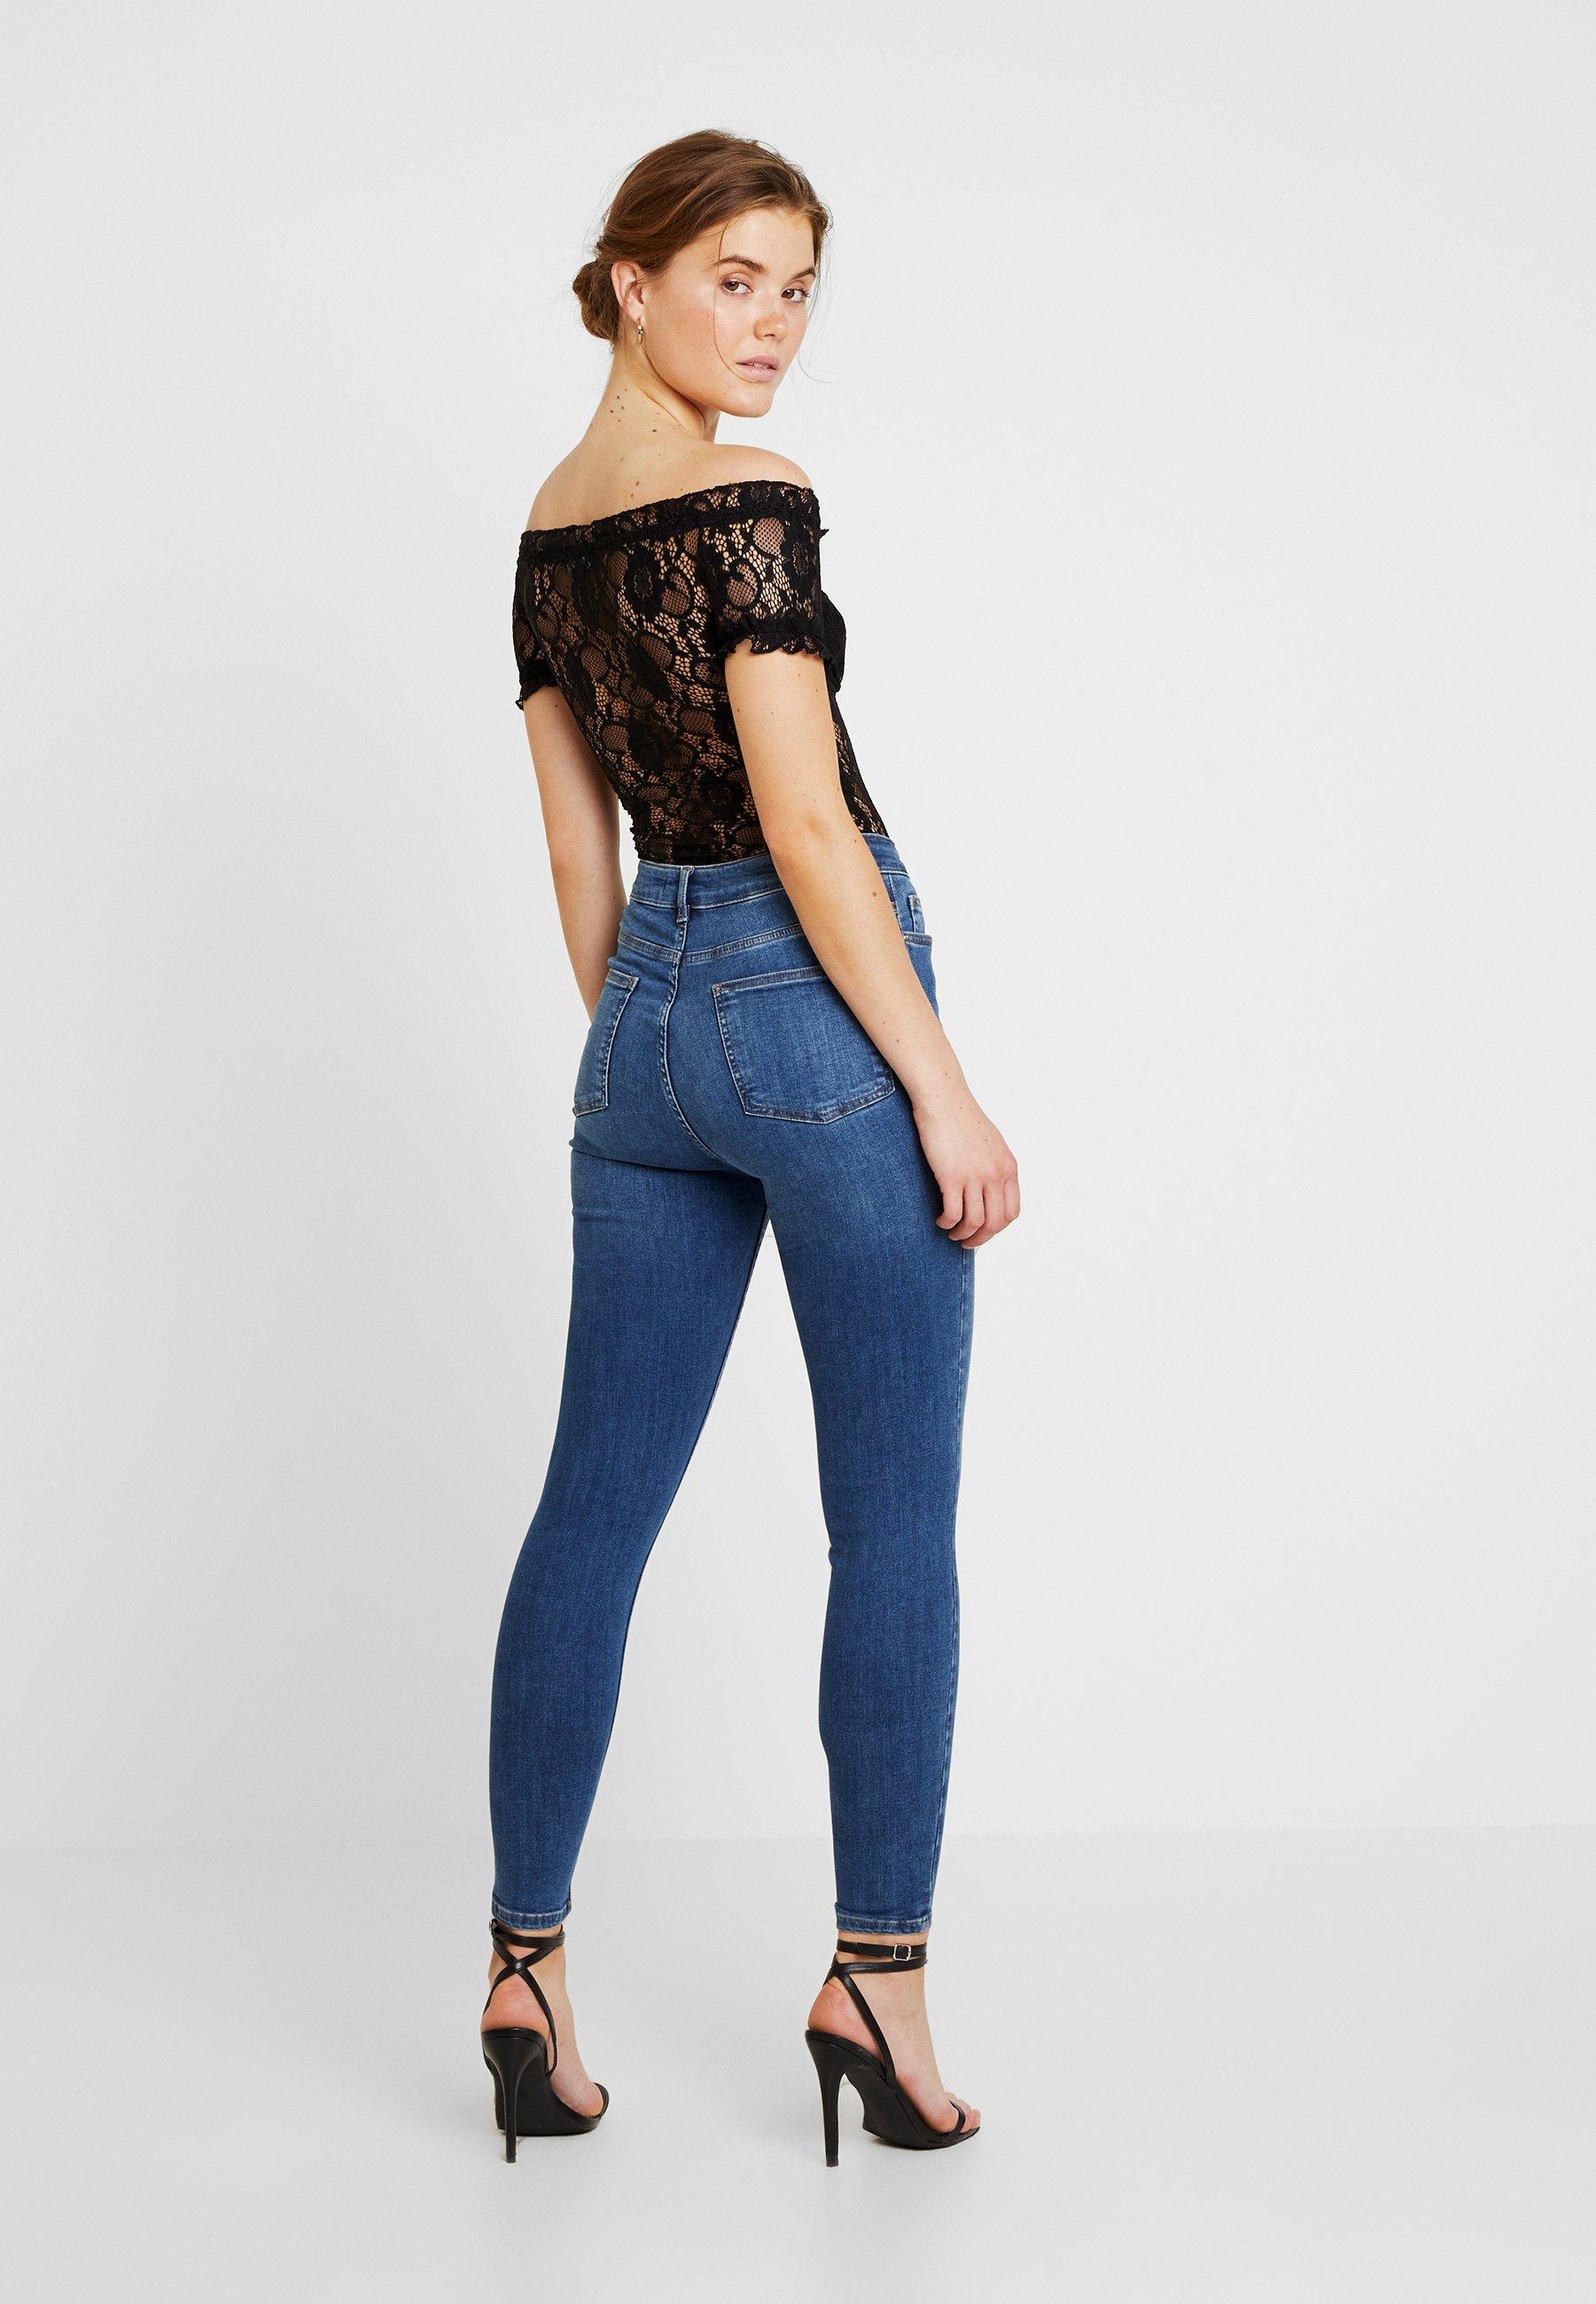 Look Black Milkmaid Imprimé Go New BodyT shirt Pn0kOw8